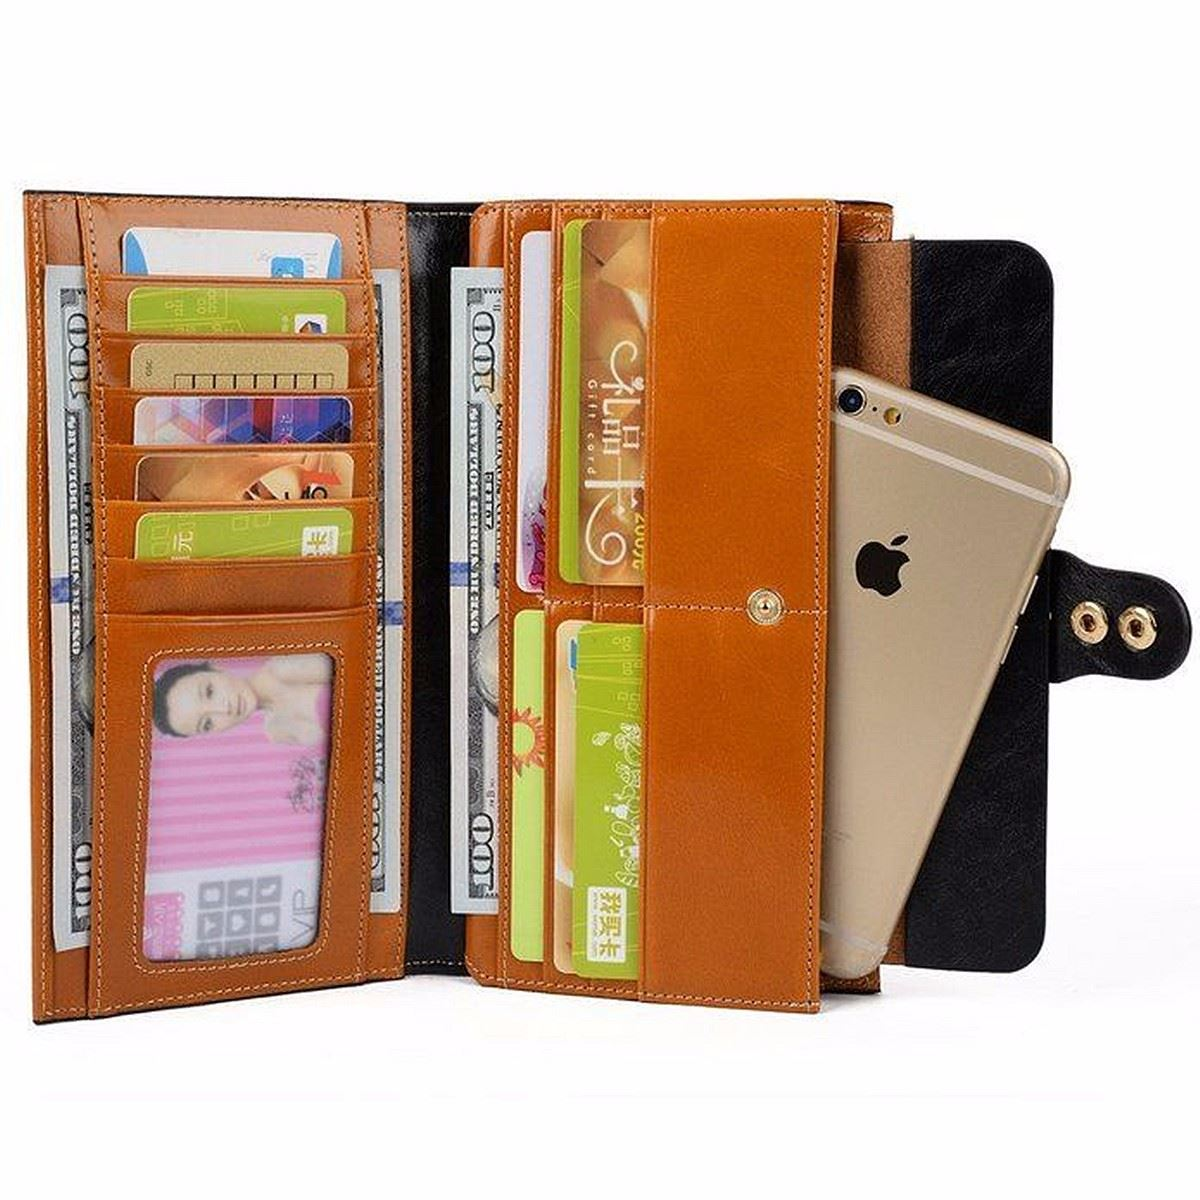 aequeen bolso do telefone bolsa Wallet Estilo 3 : Vintage Wallet Lady Purses Luxury Brand Designer